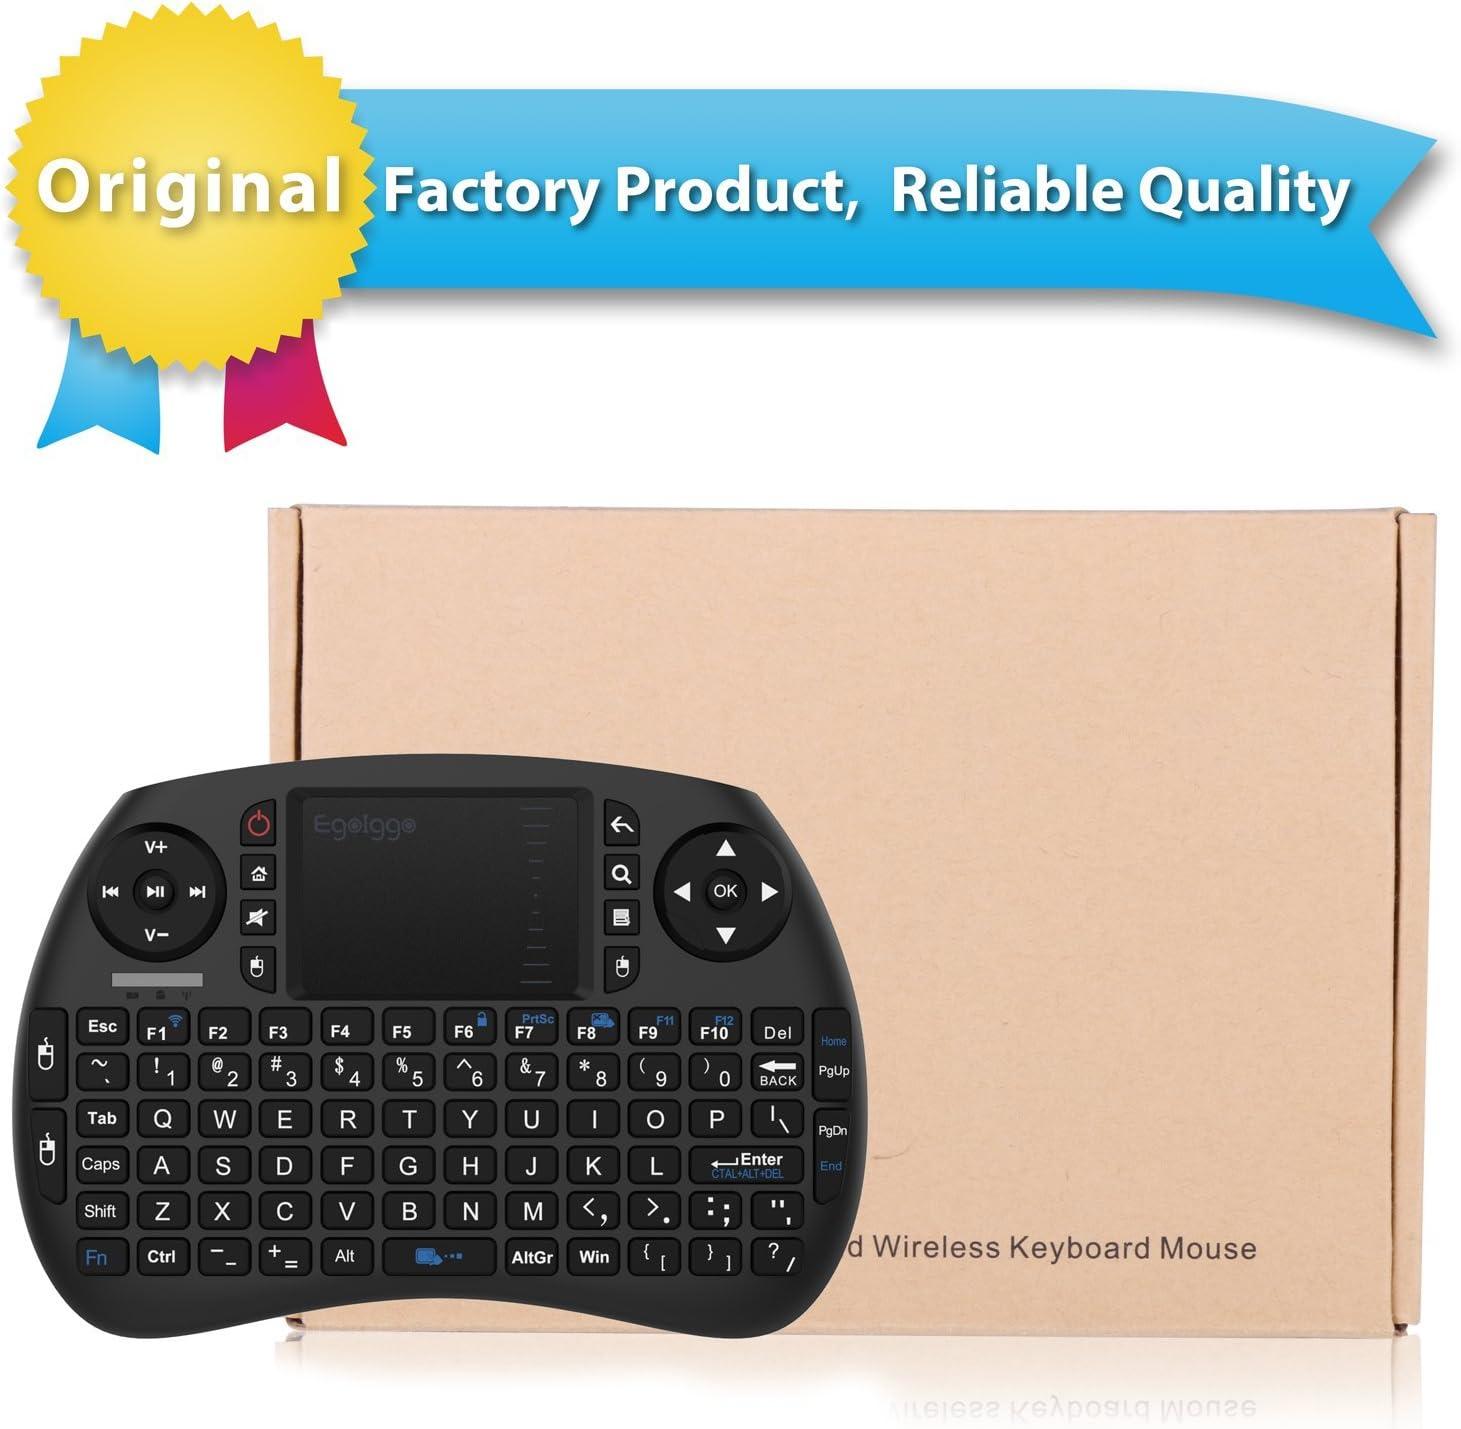 EgoIggo 2.4GHz Mini Teclado inalámbrico Touchpad ratón Compatible con Raspberry Pi Android Box,Google Box,Pad PC Smart TV Control Remoto (Negro): Amazon.es: Electrónica